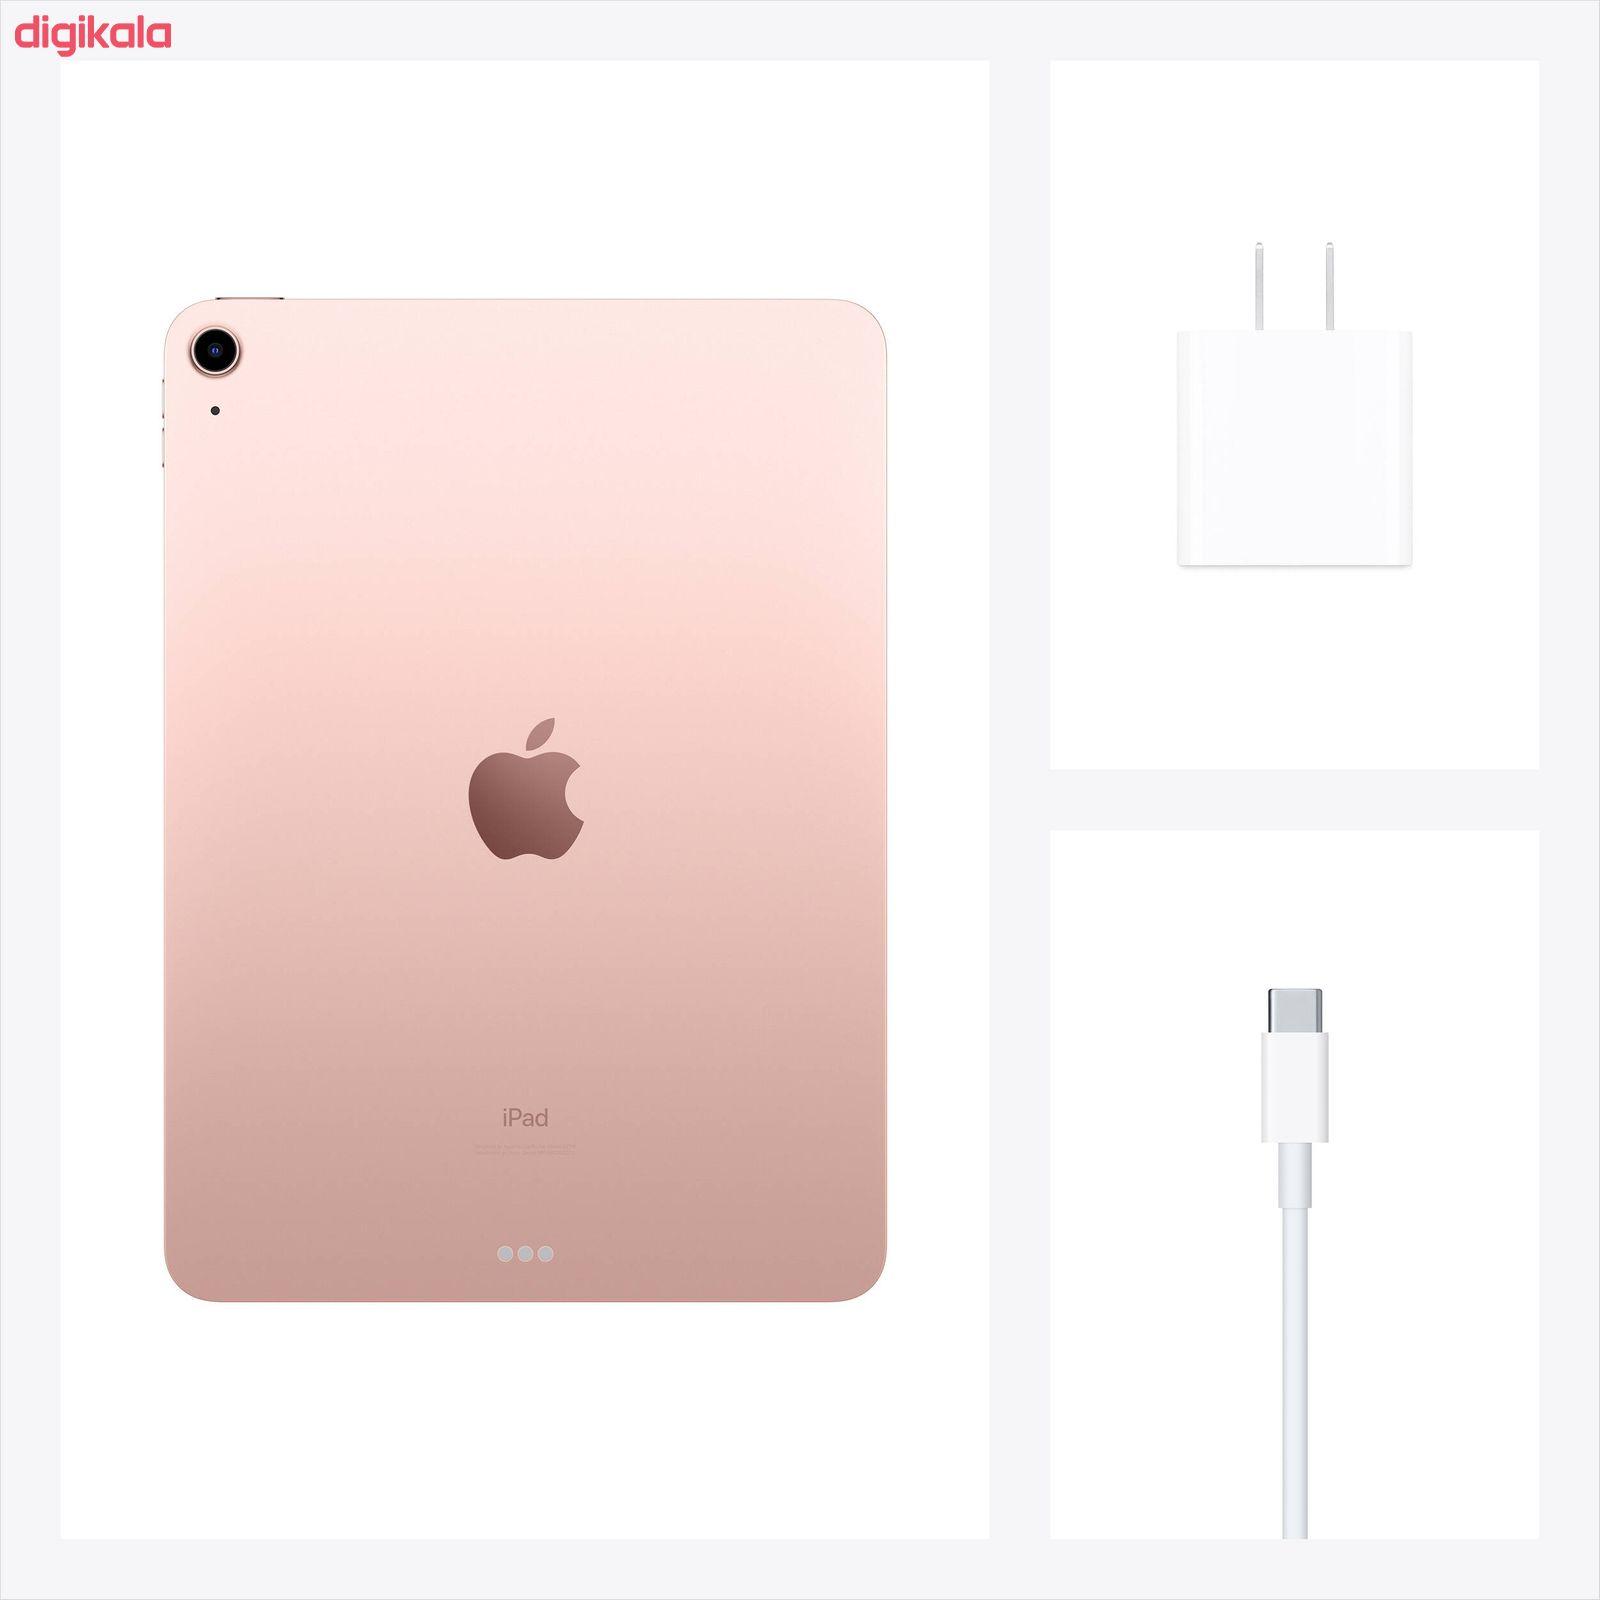 تبلت اپل مدل iPad Air 10.9 inch 2020 WiFi ظرفیت 64 گیگابایت  main 1 12